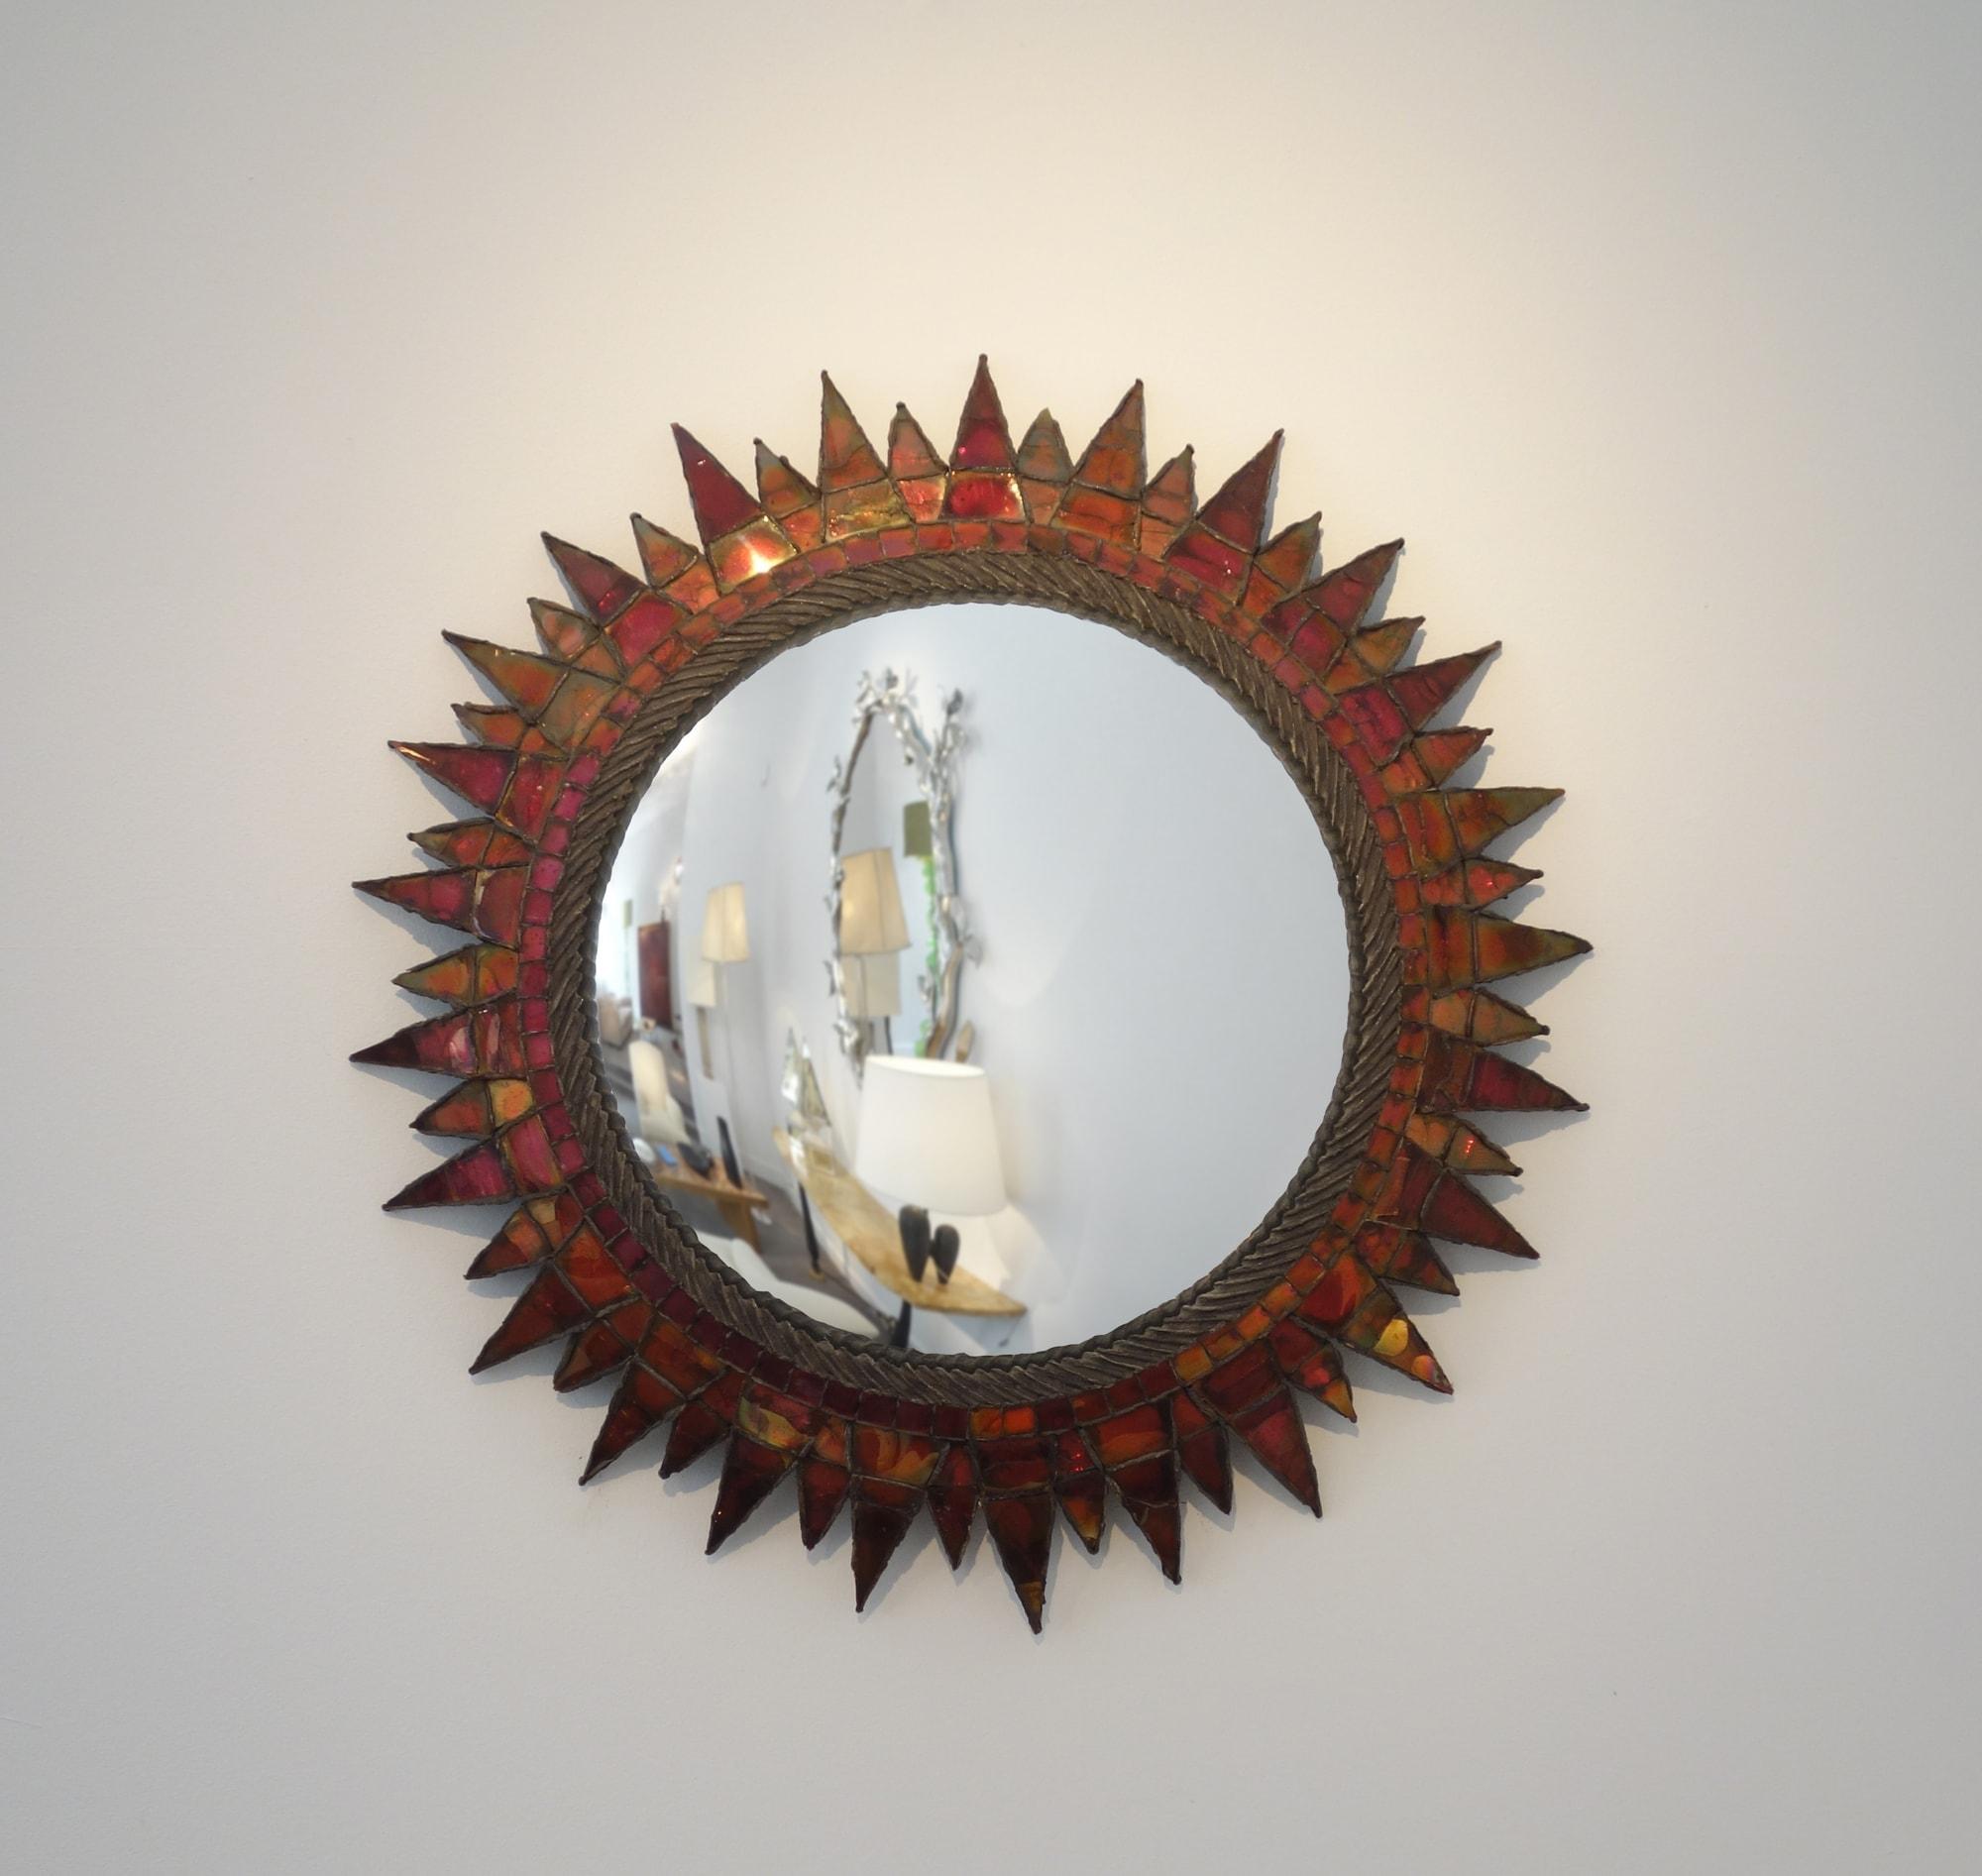 Line Vautrin, Miroir « Soleil à pointes n°3 » (vendu), vue 01